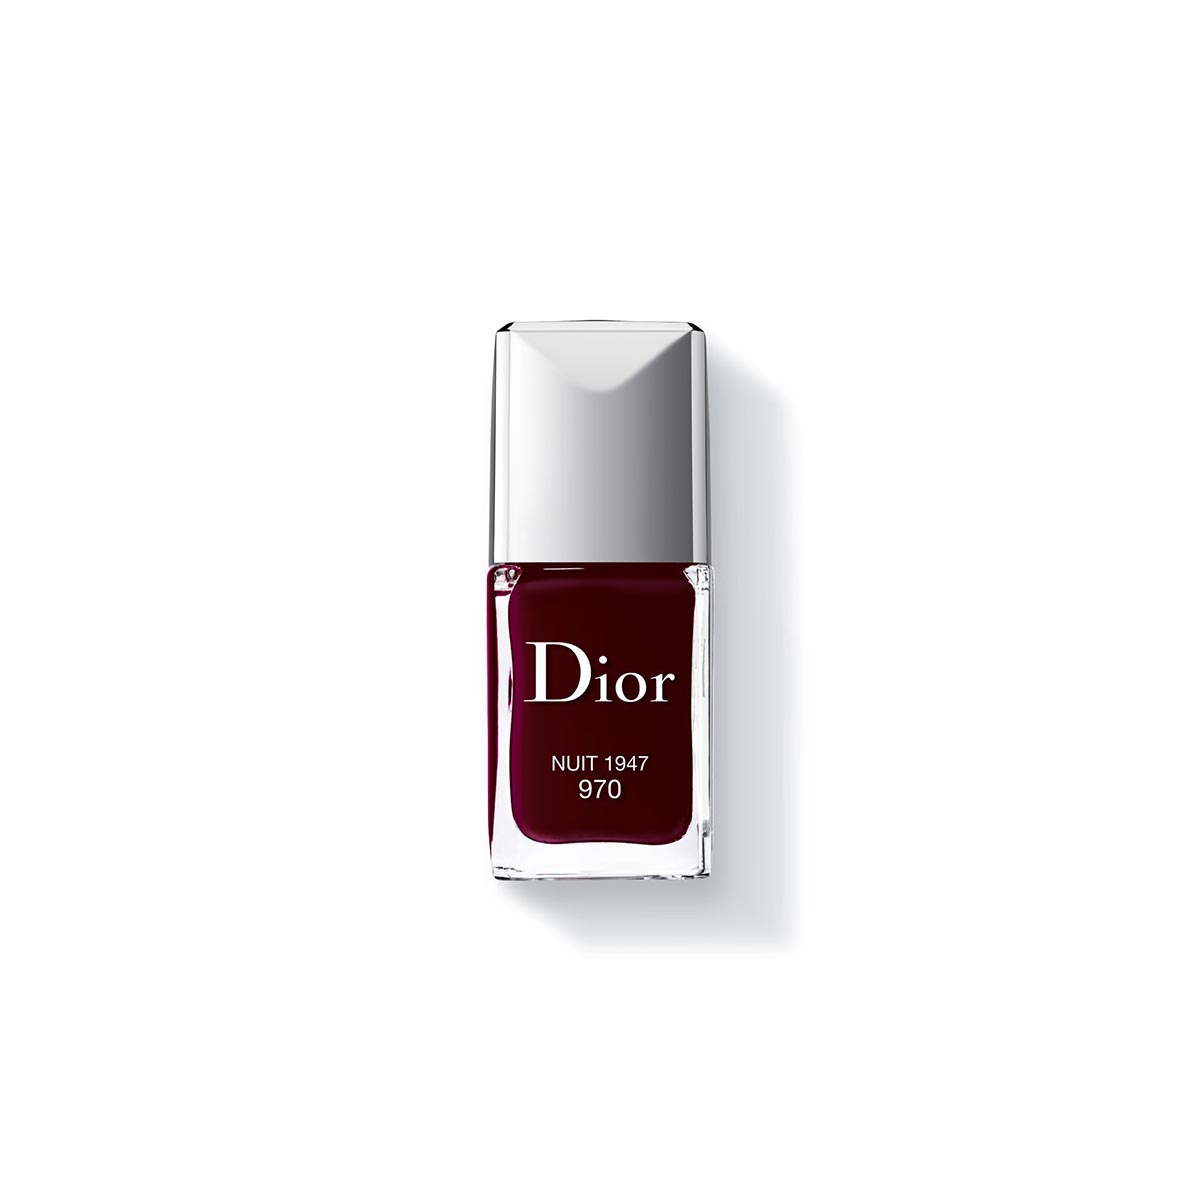 Dior rouge dior vernis 970 nuit 1947